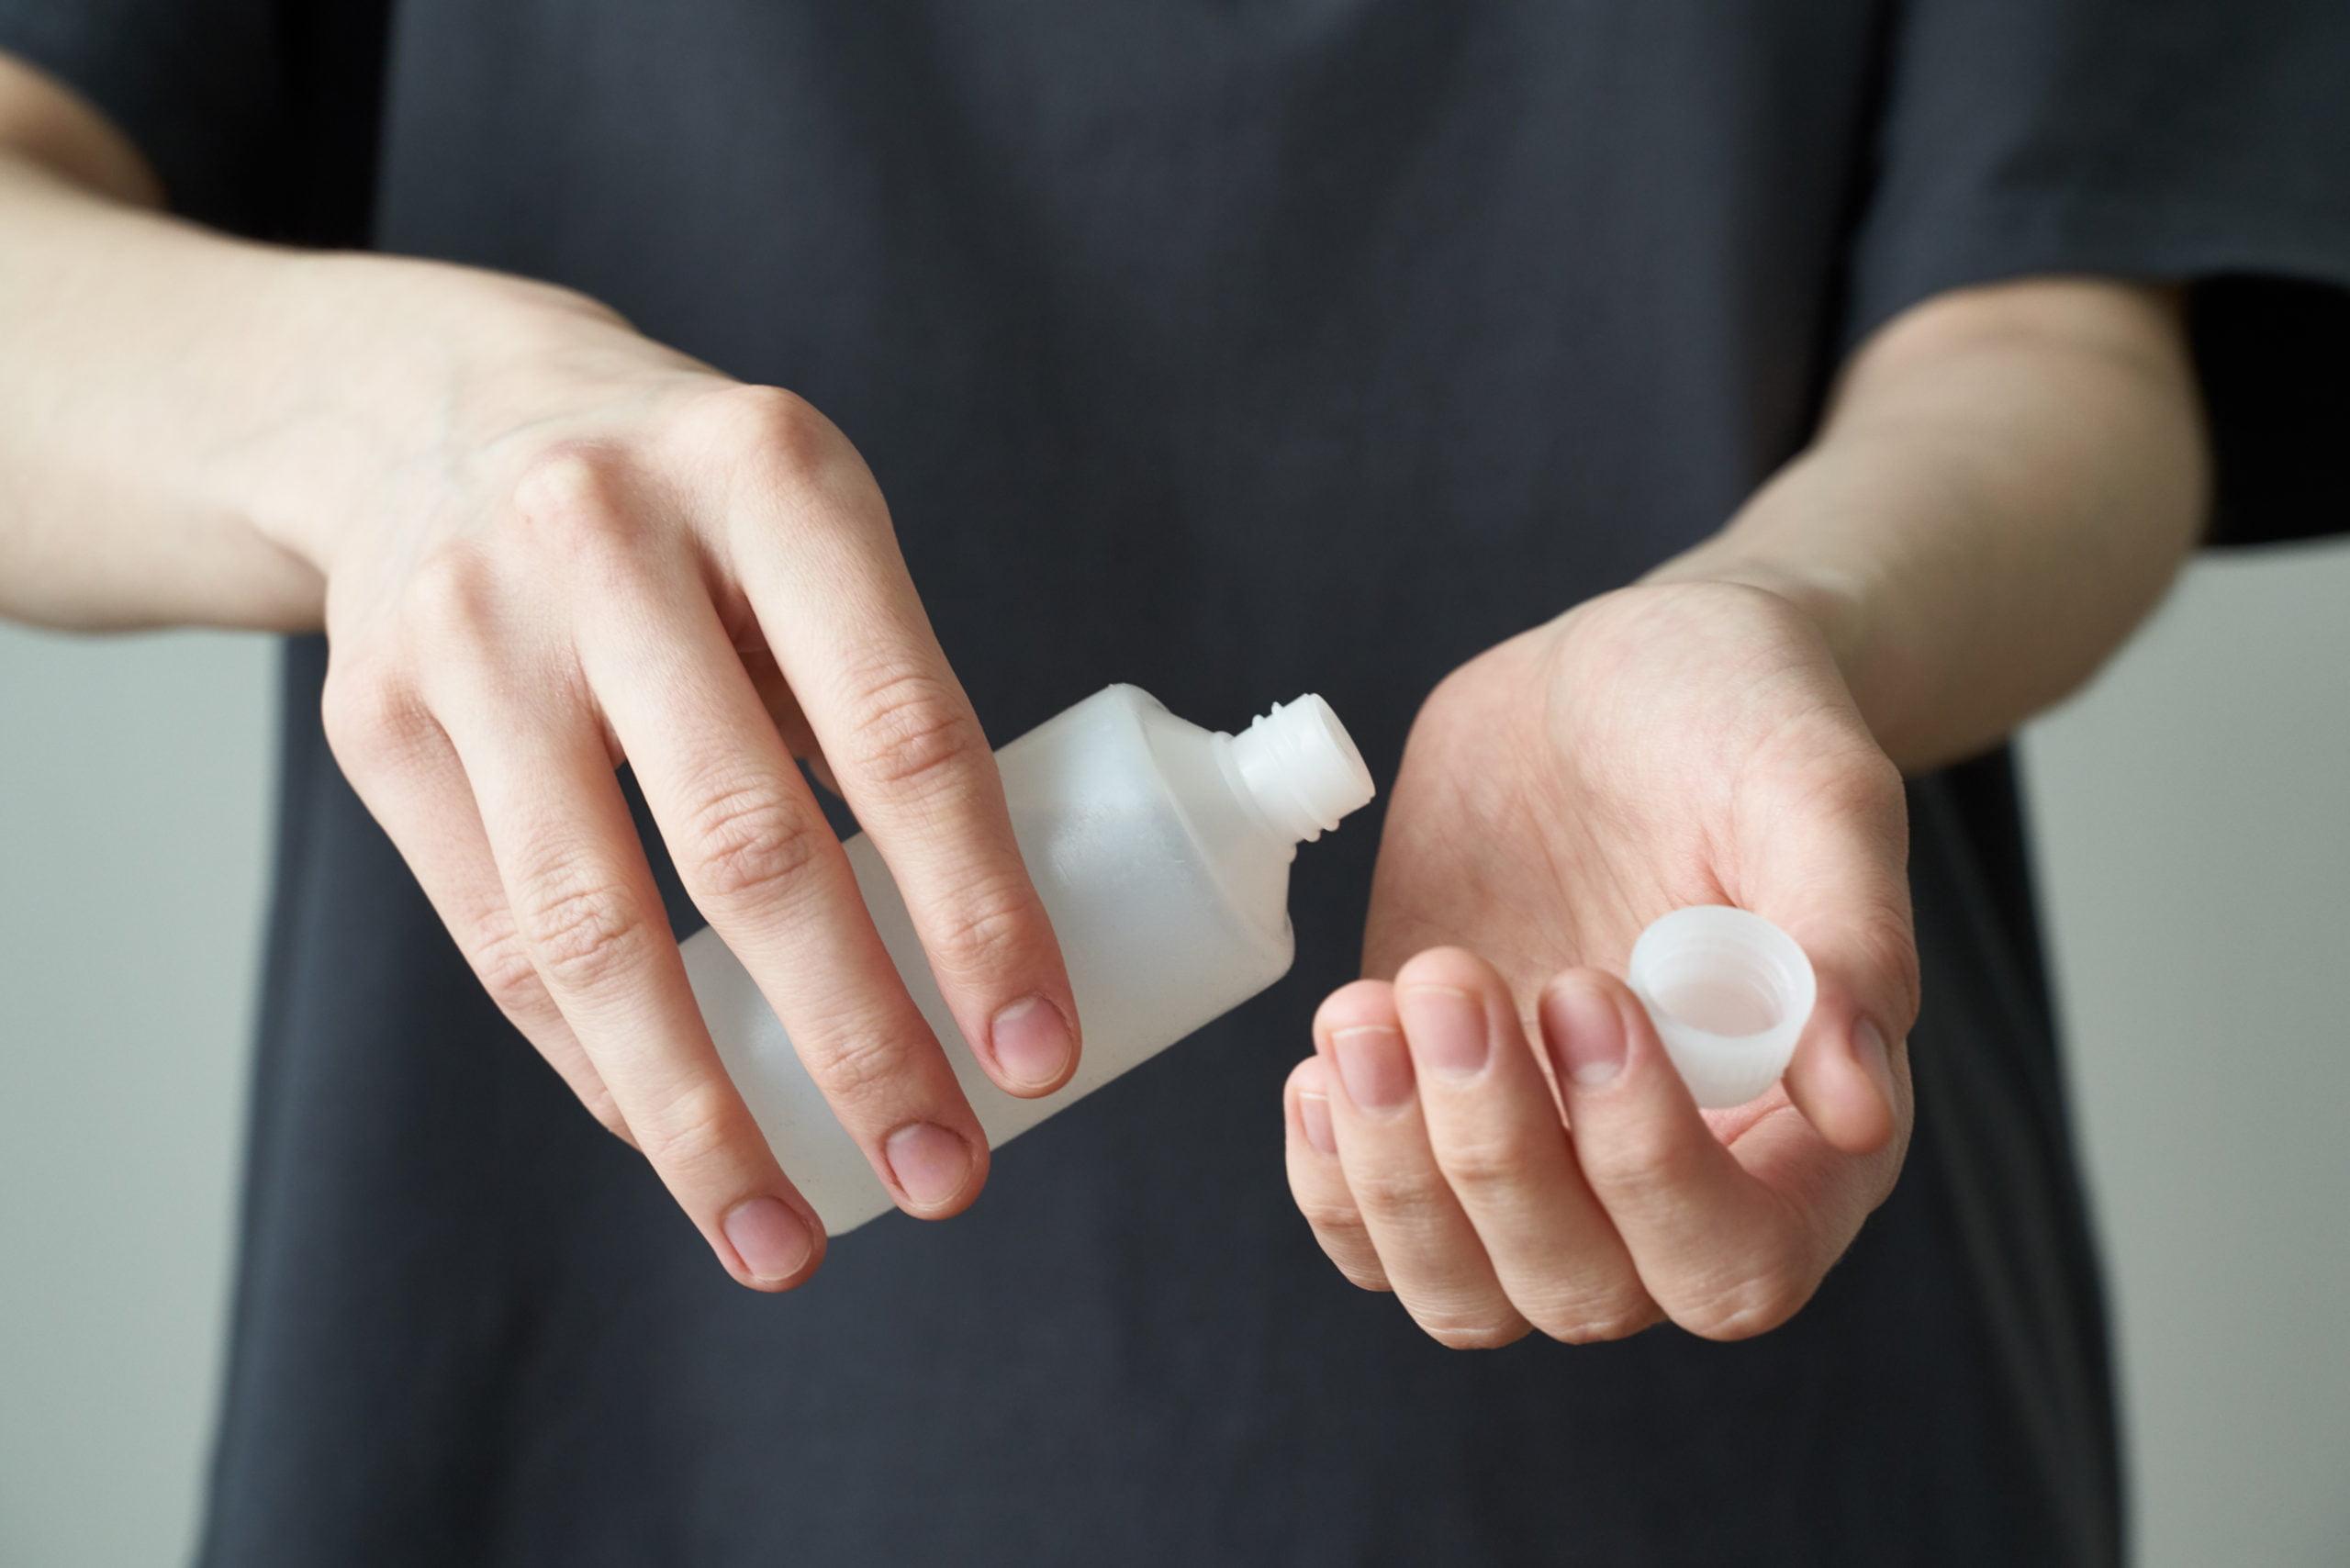 Intrinsically safe store hand sanitizer